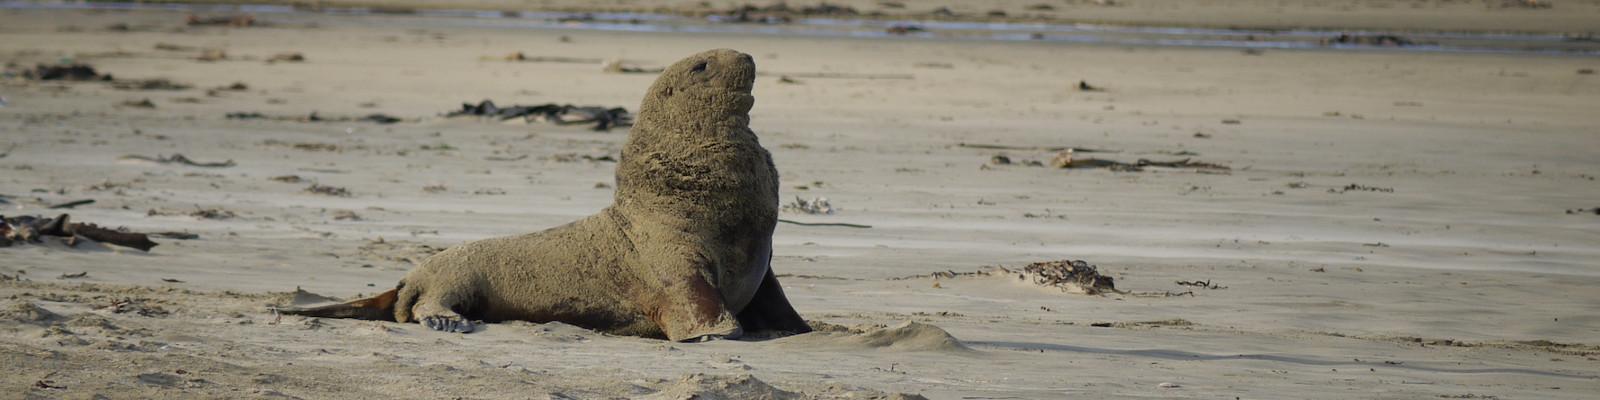 Lion de mer - Canibal Bay - Nouvelle-zélande - 2010